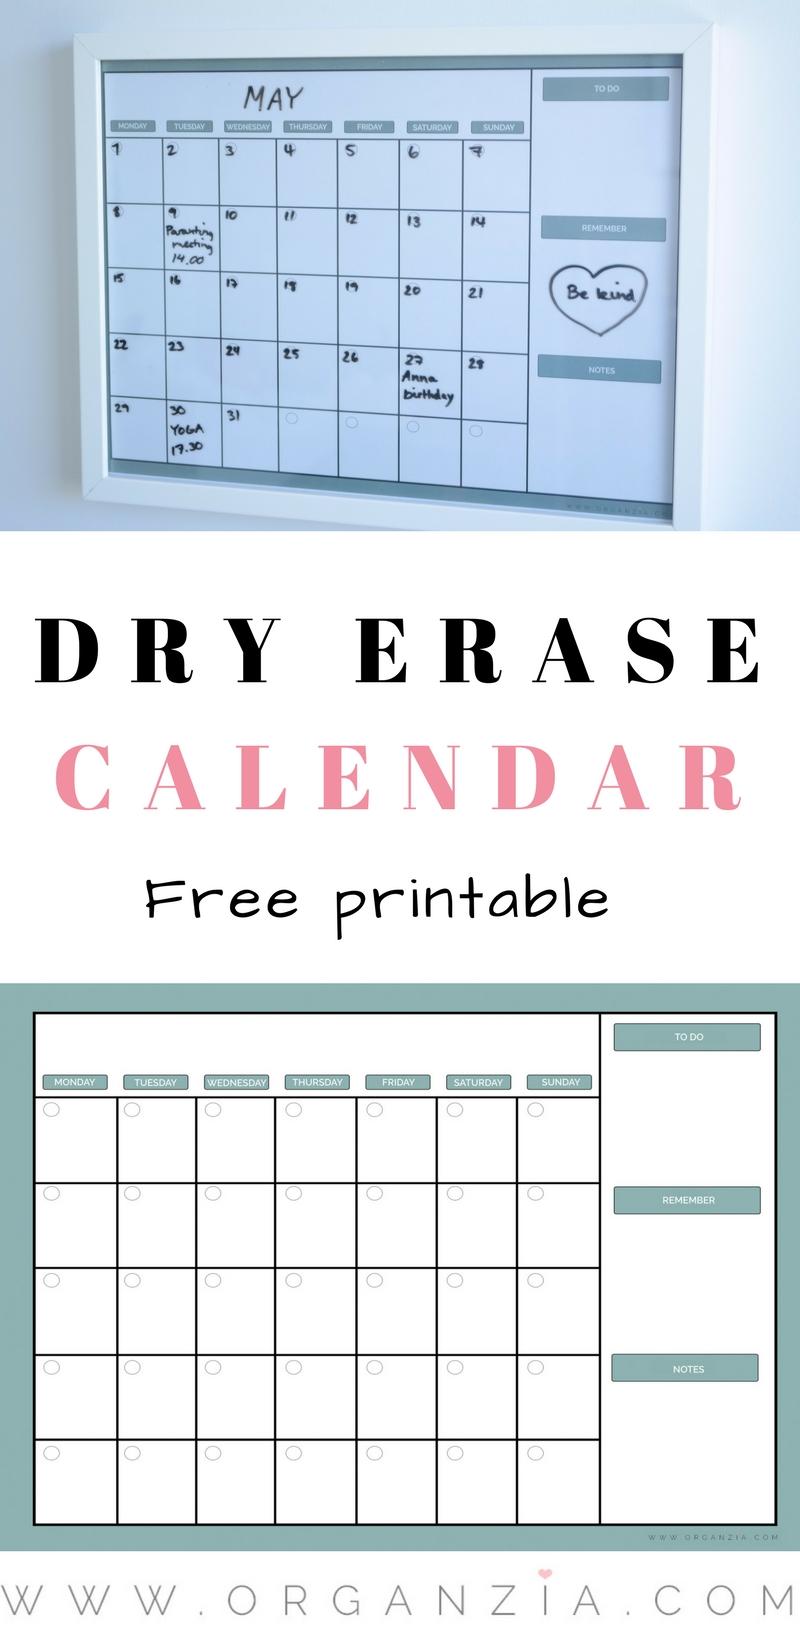 Weekly Calendar Diy : Diy monthly planner dry erase calendar free printable